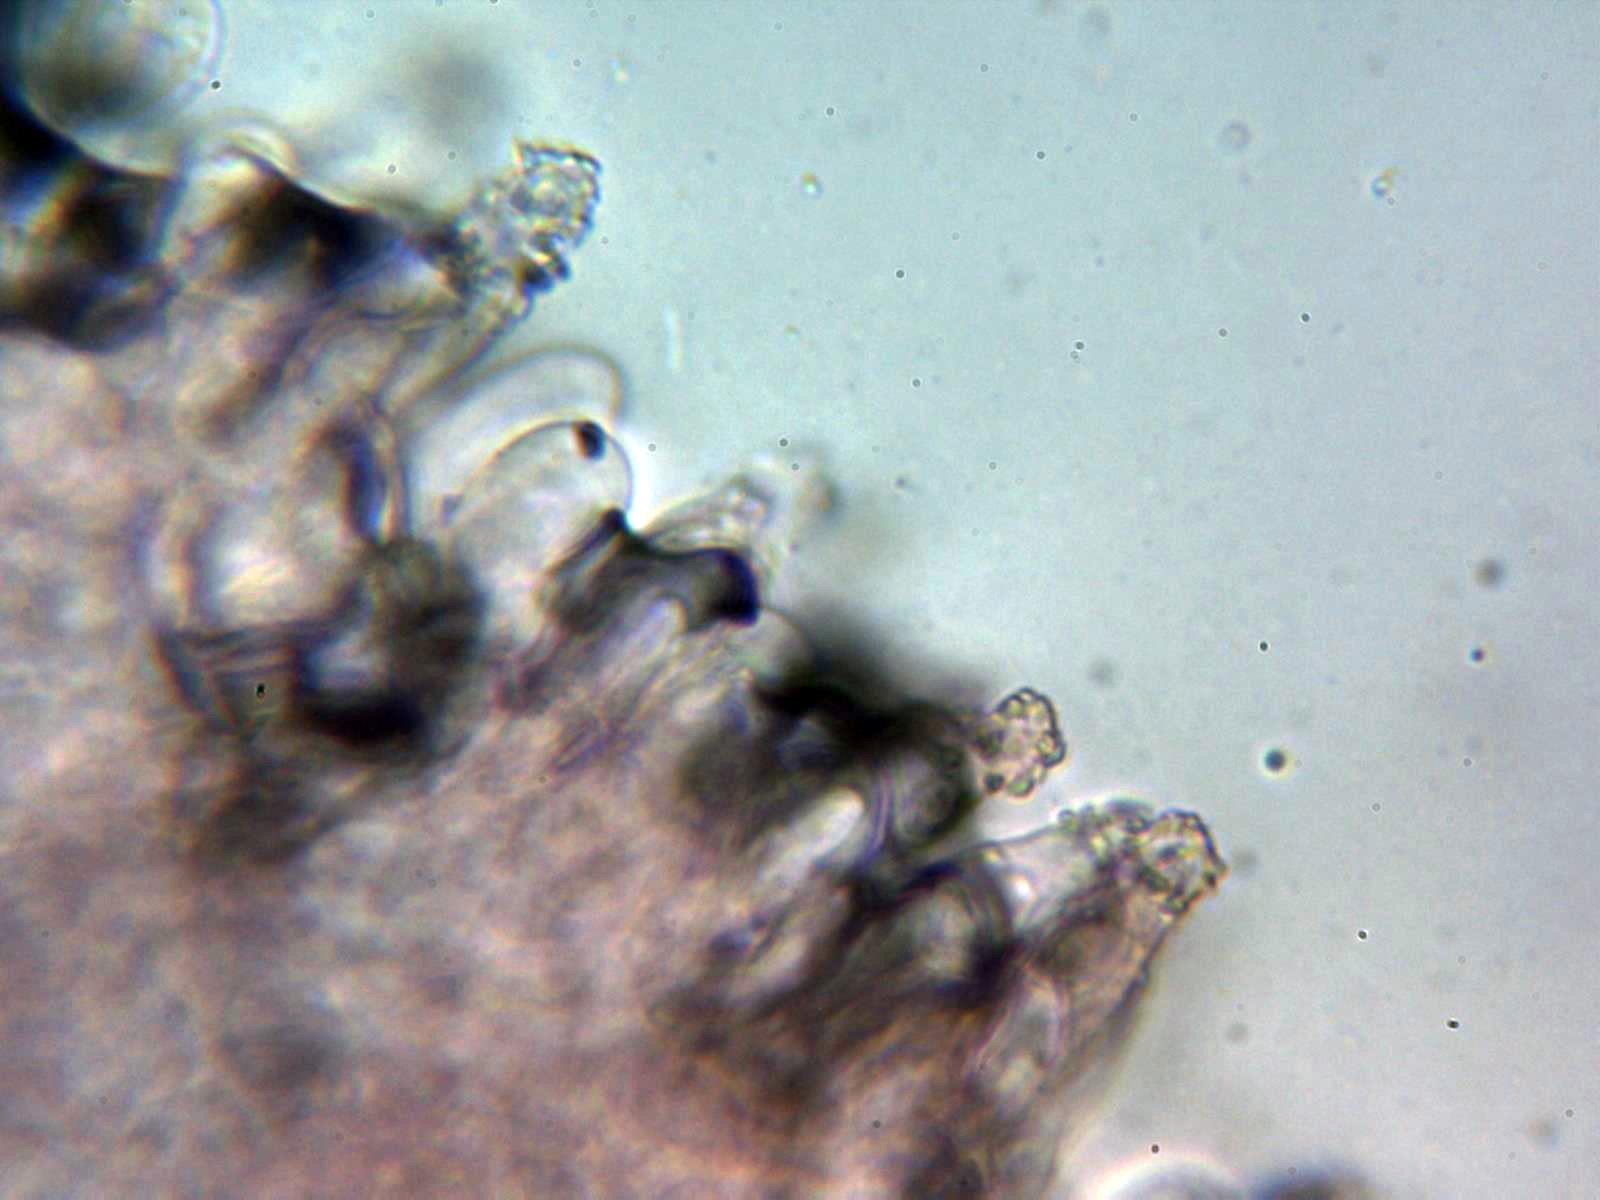 Queilocistidios4_2020-08-12.jpg